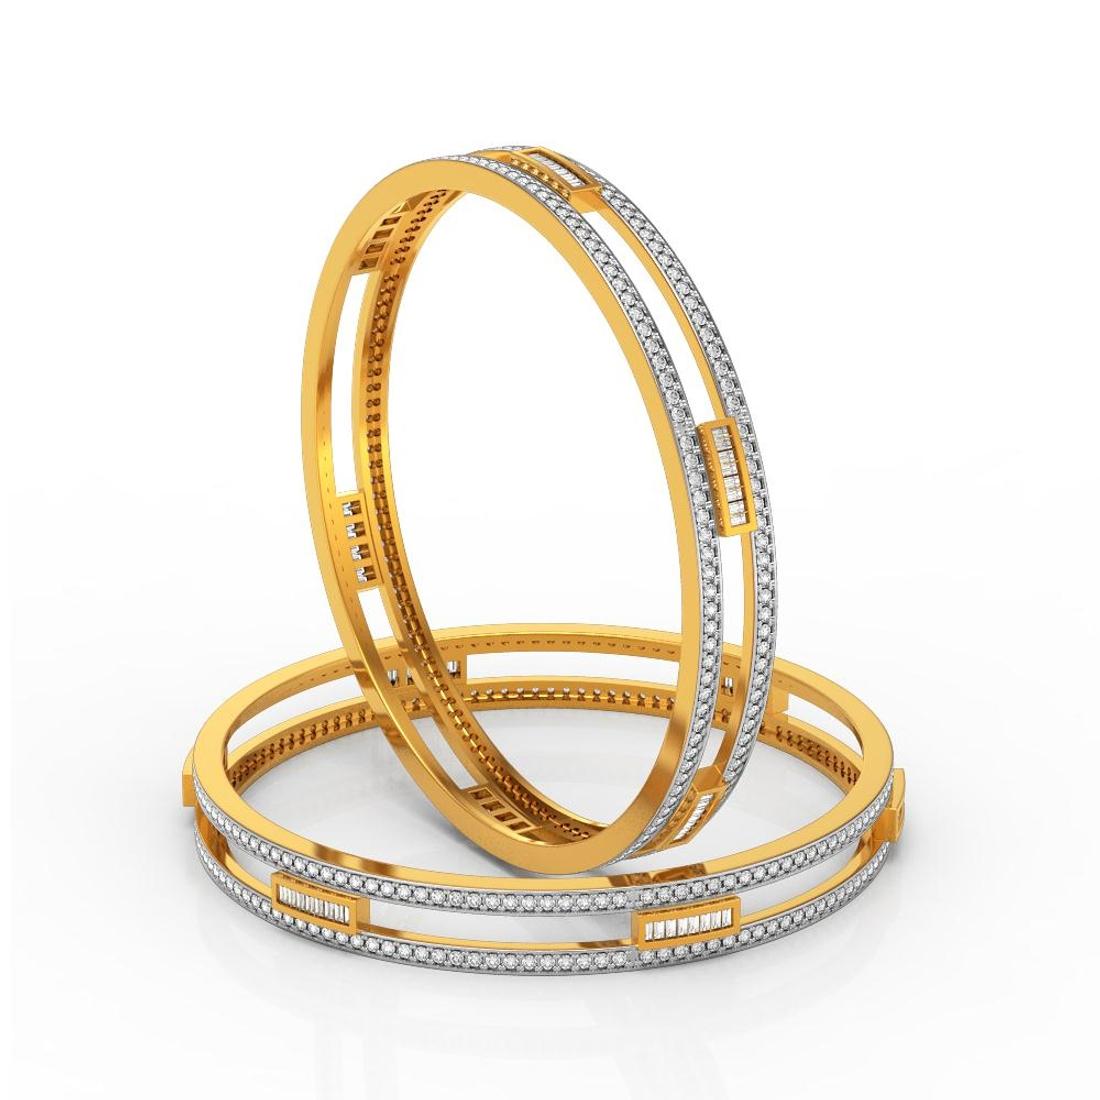 Charu Jewels Diamond Bangle Made with 49.23  Gms 18 KT Yellow Gold Gold And 5.59 Carat Diamonds